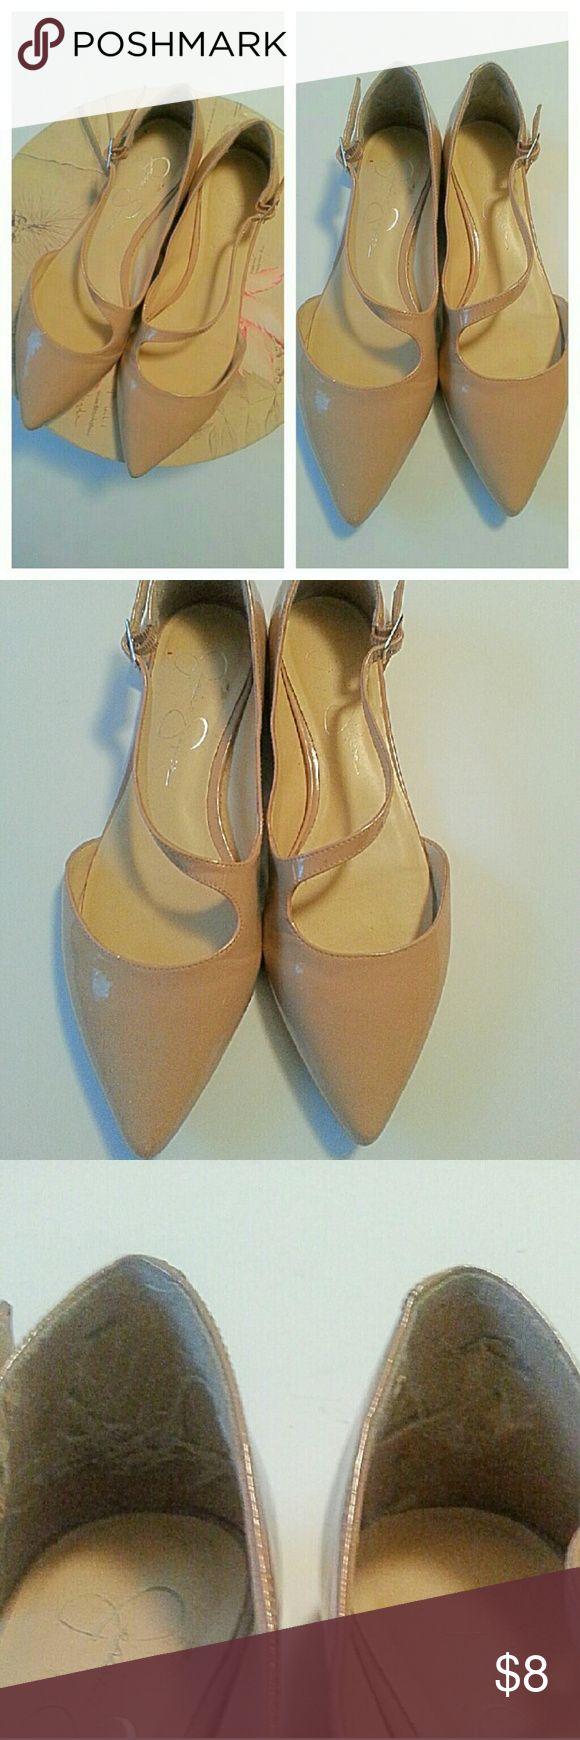 Jessica simpson flats Nude patent leathe flats size 8.5 Jessica Simpson Shoes Athletic Shoes